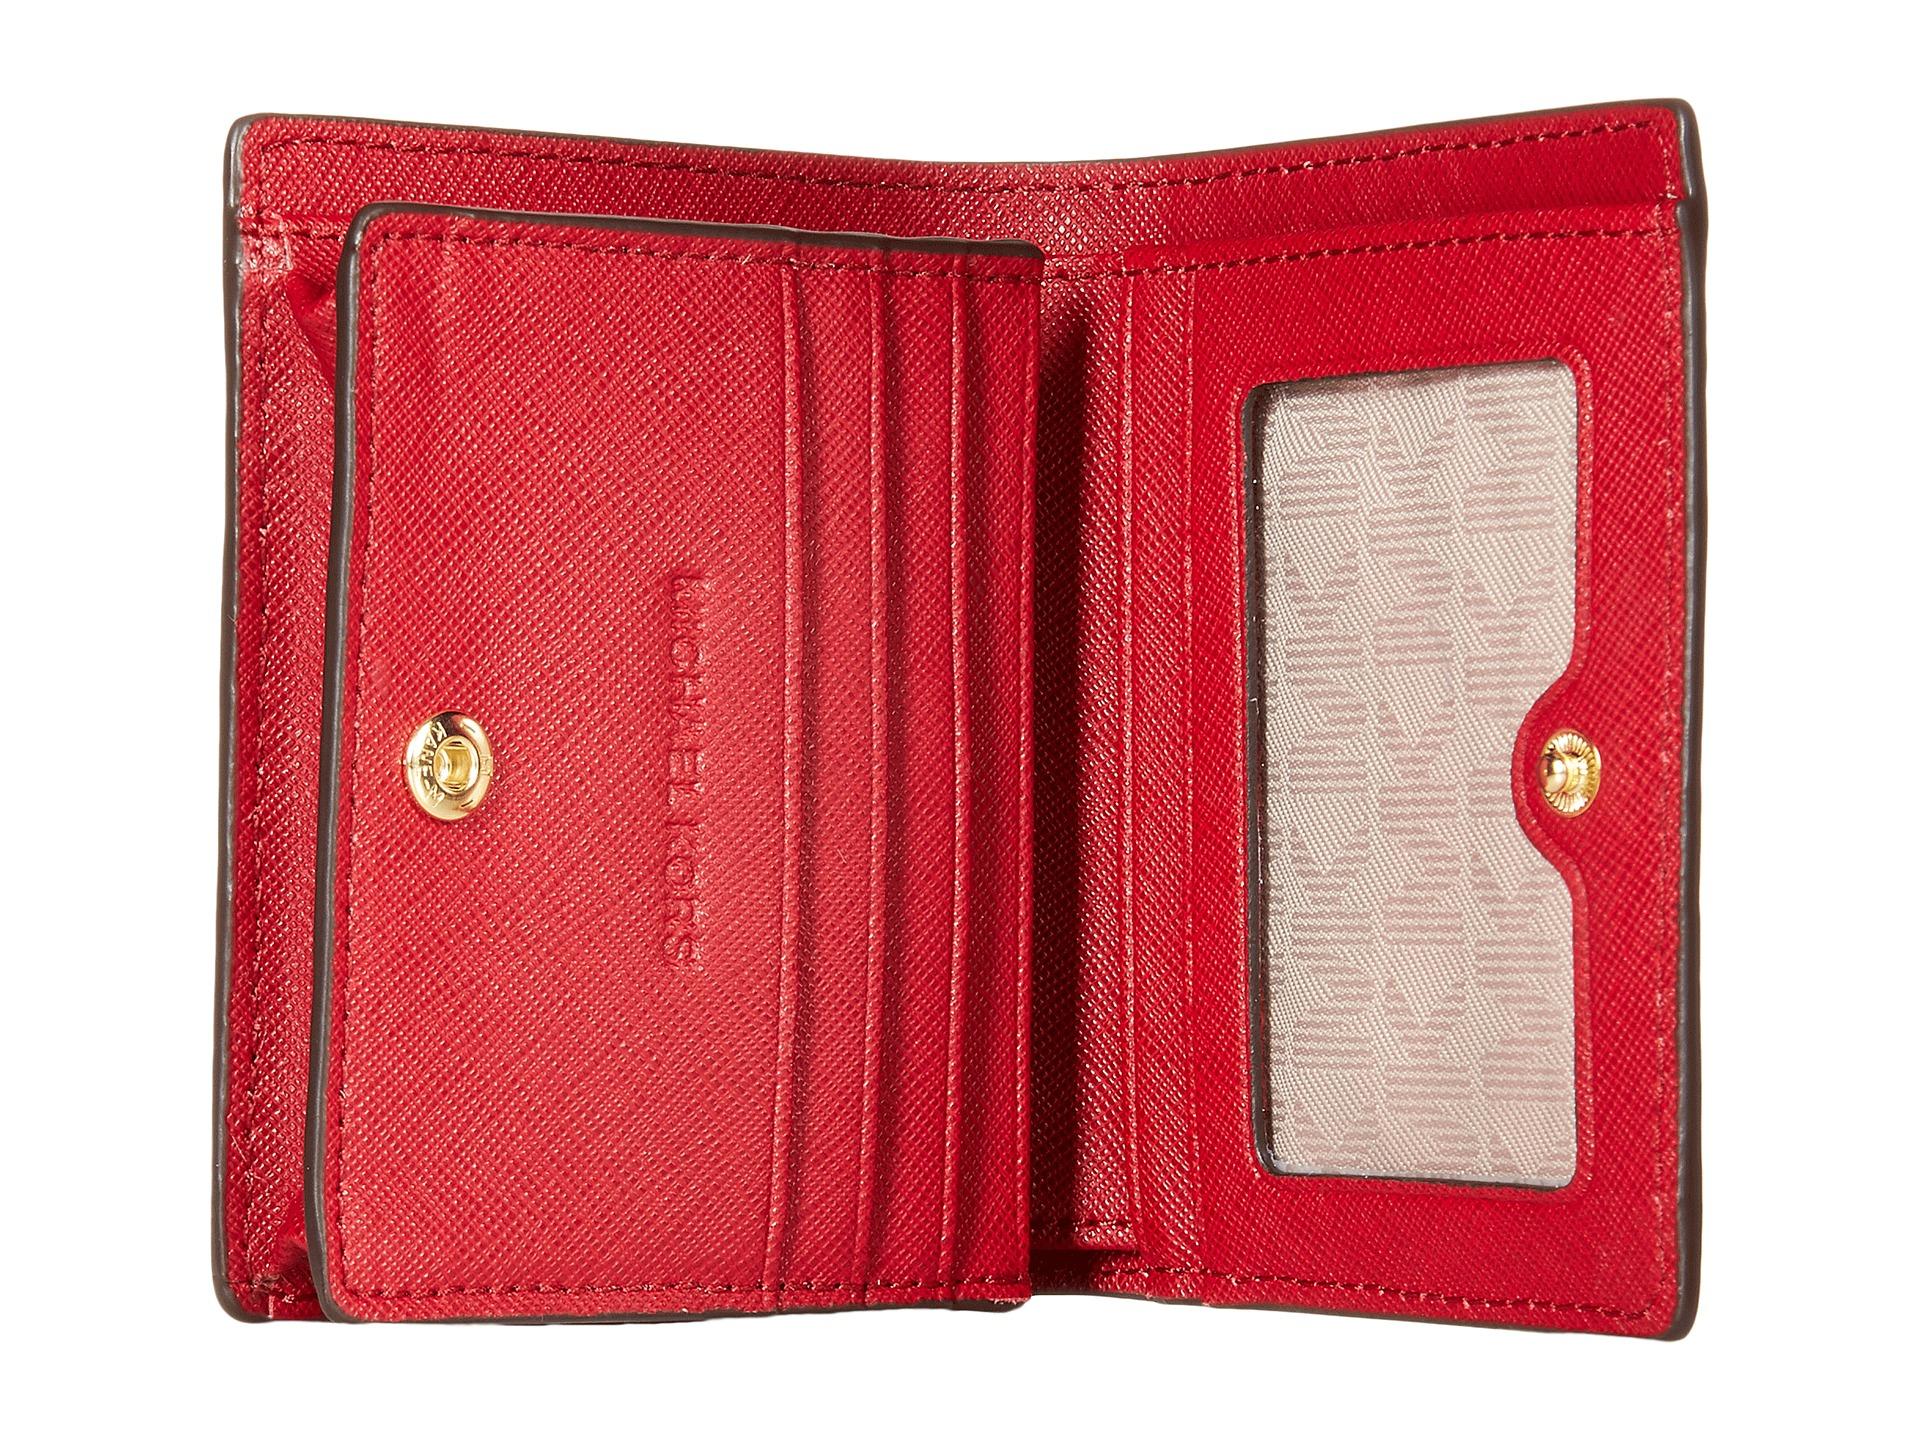 e0bc6e34cbc2 Lyst - MICHAEL Michael Kors Jet Set Travel Flap Card Holder in Red